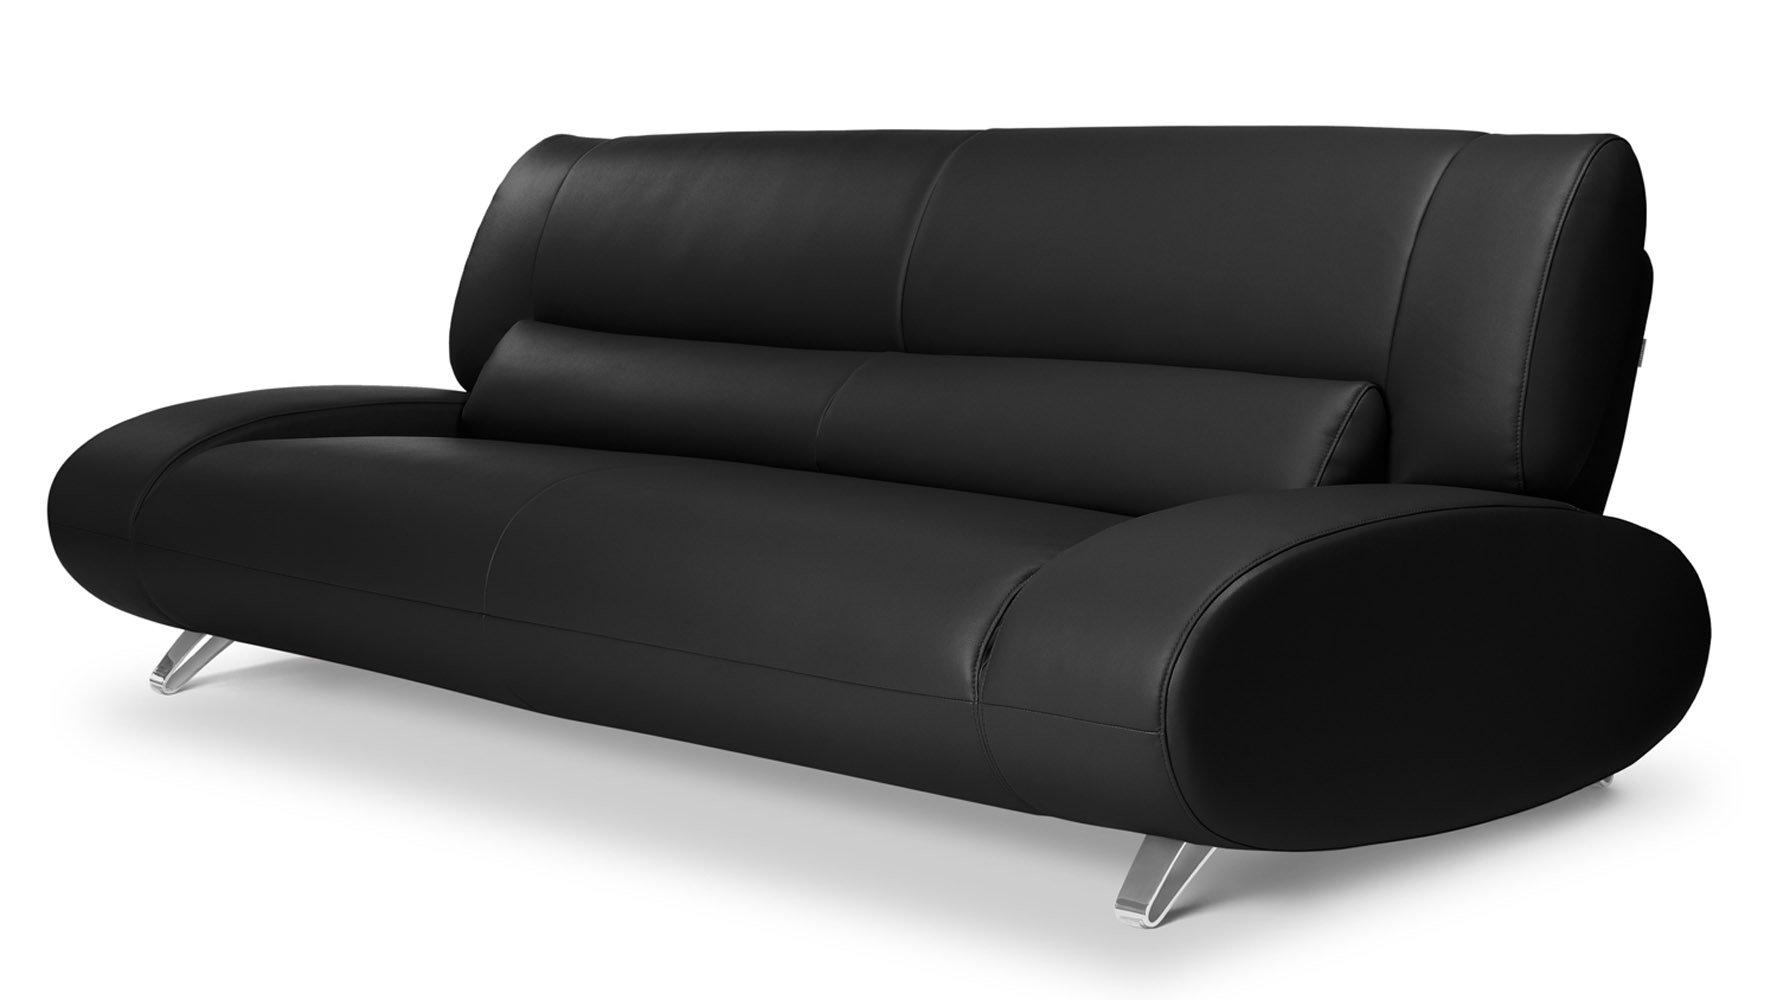 Stupendous Zuri Furniture Aspen Leather Sofa Theyellowbook Wood Chair Design Ideas Theyellowbookinfo